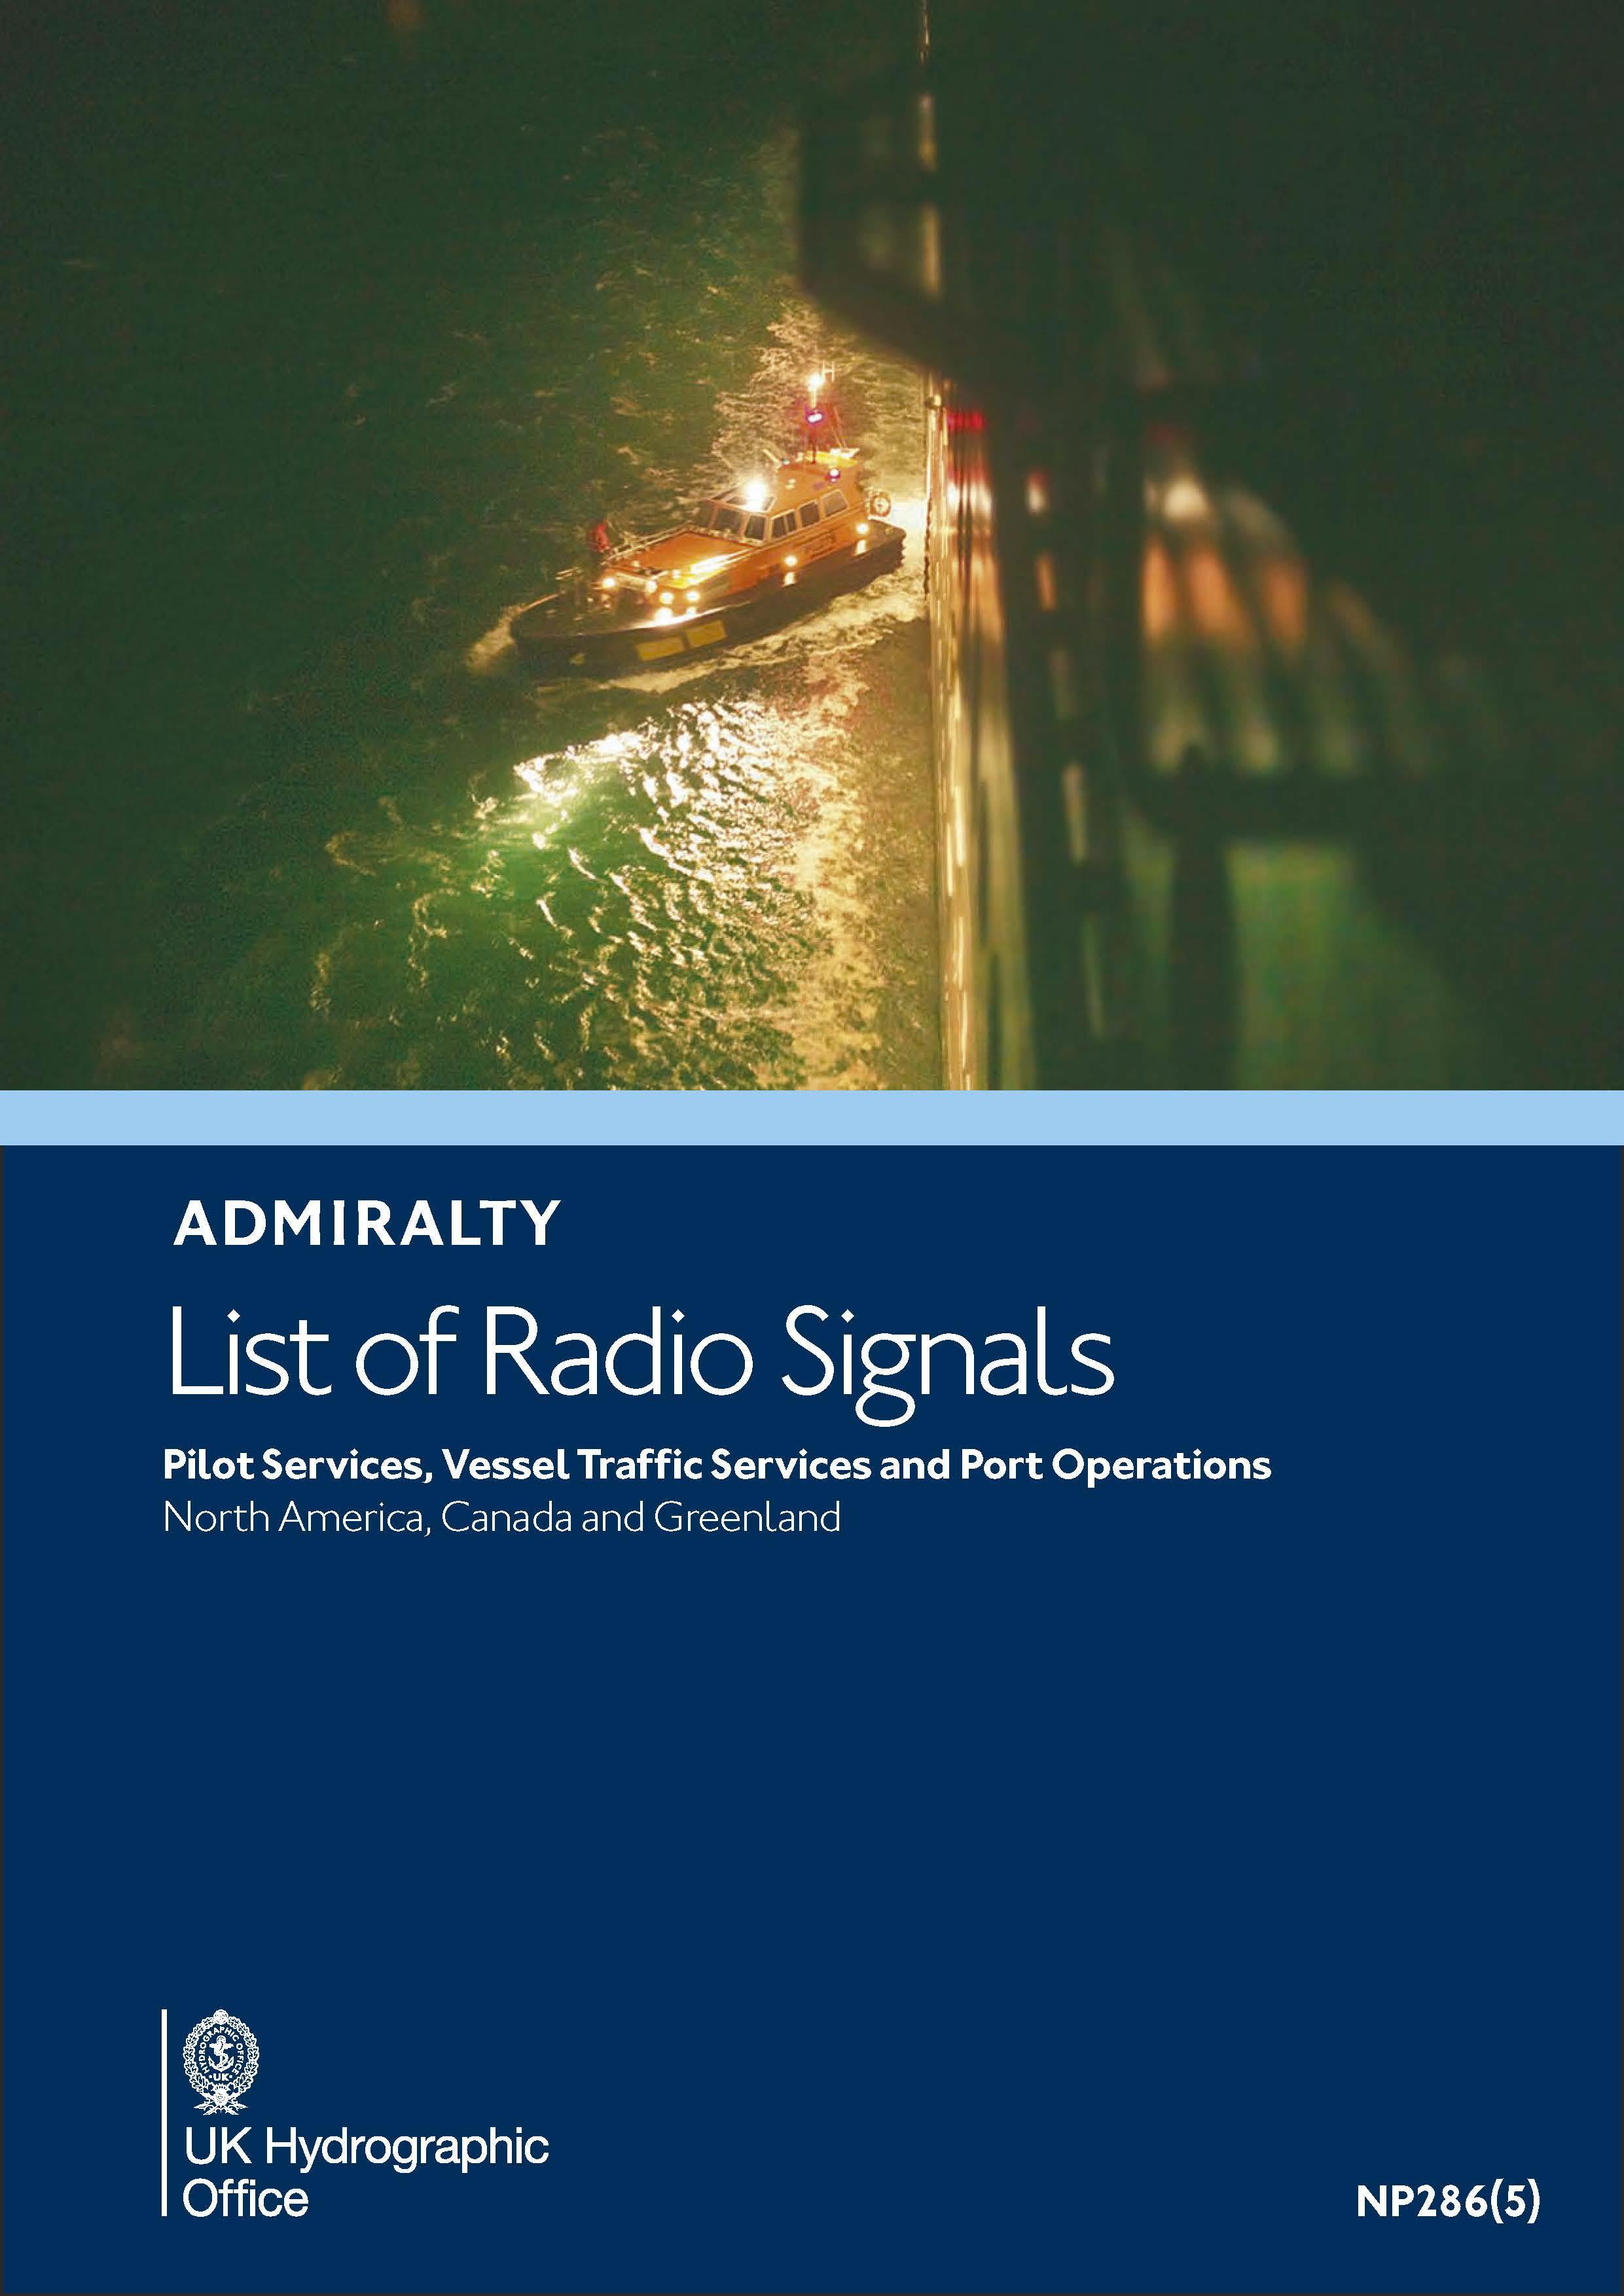 ADMIRALTY NP286(5) RadioSignals Pilot VTS Port - Westcoast NorthAmerica